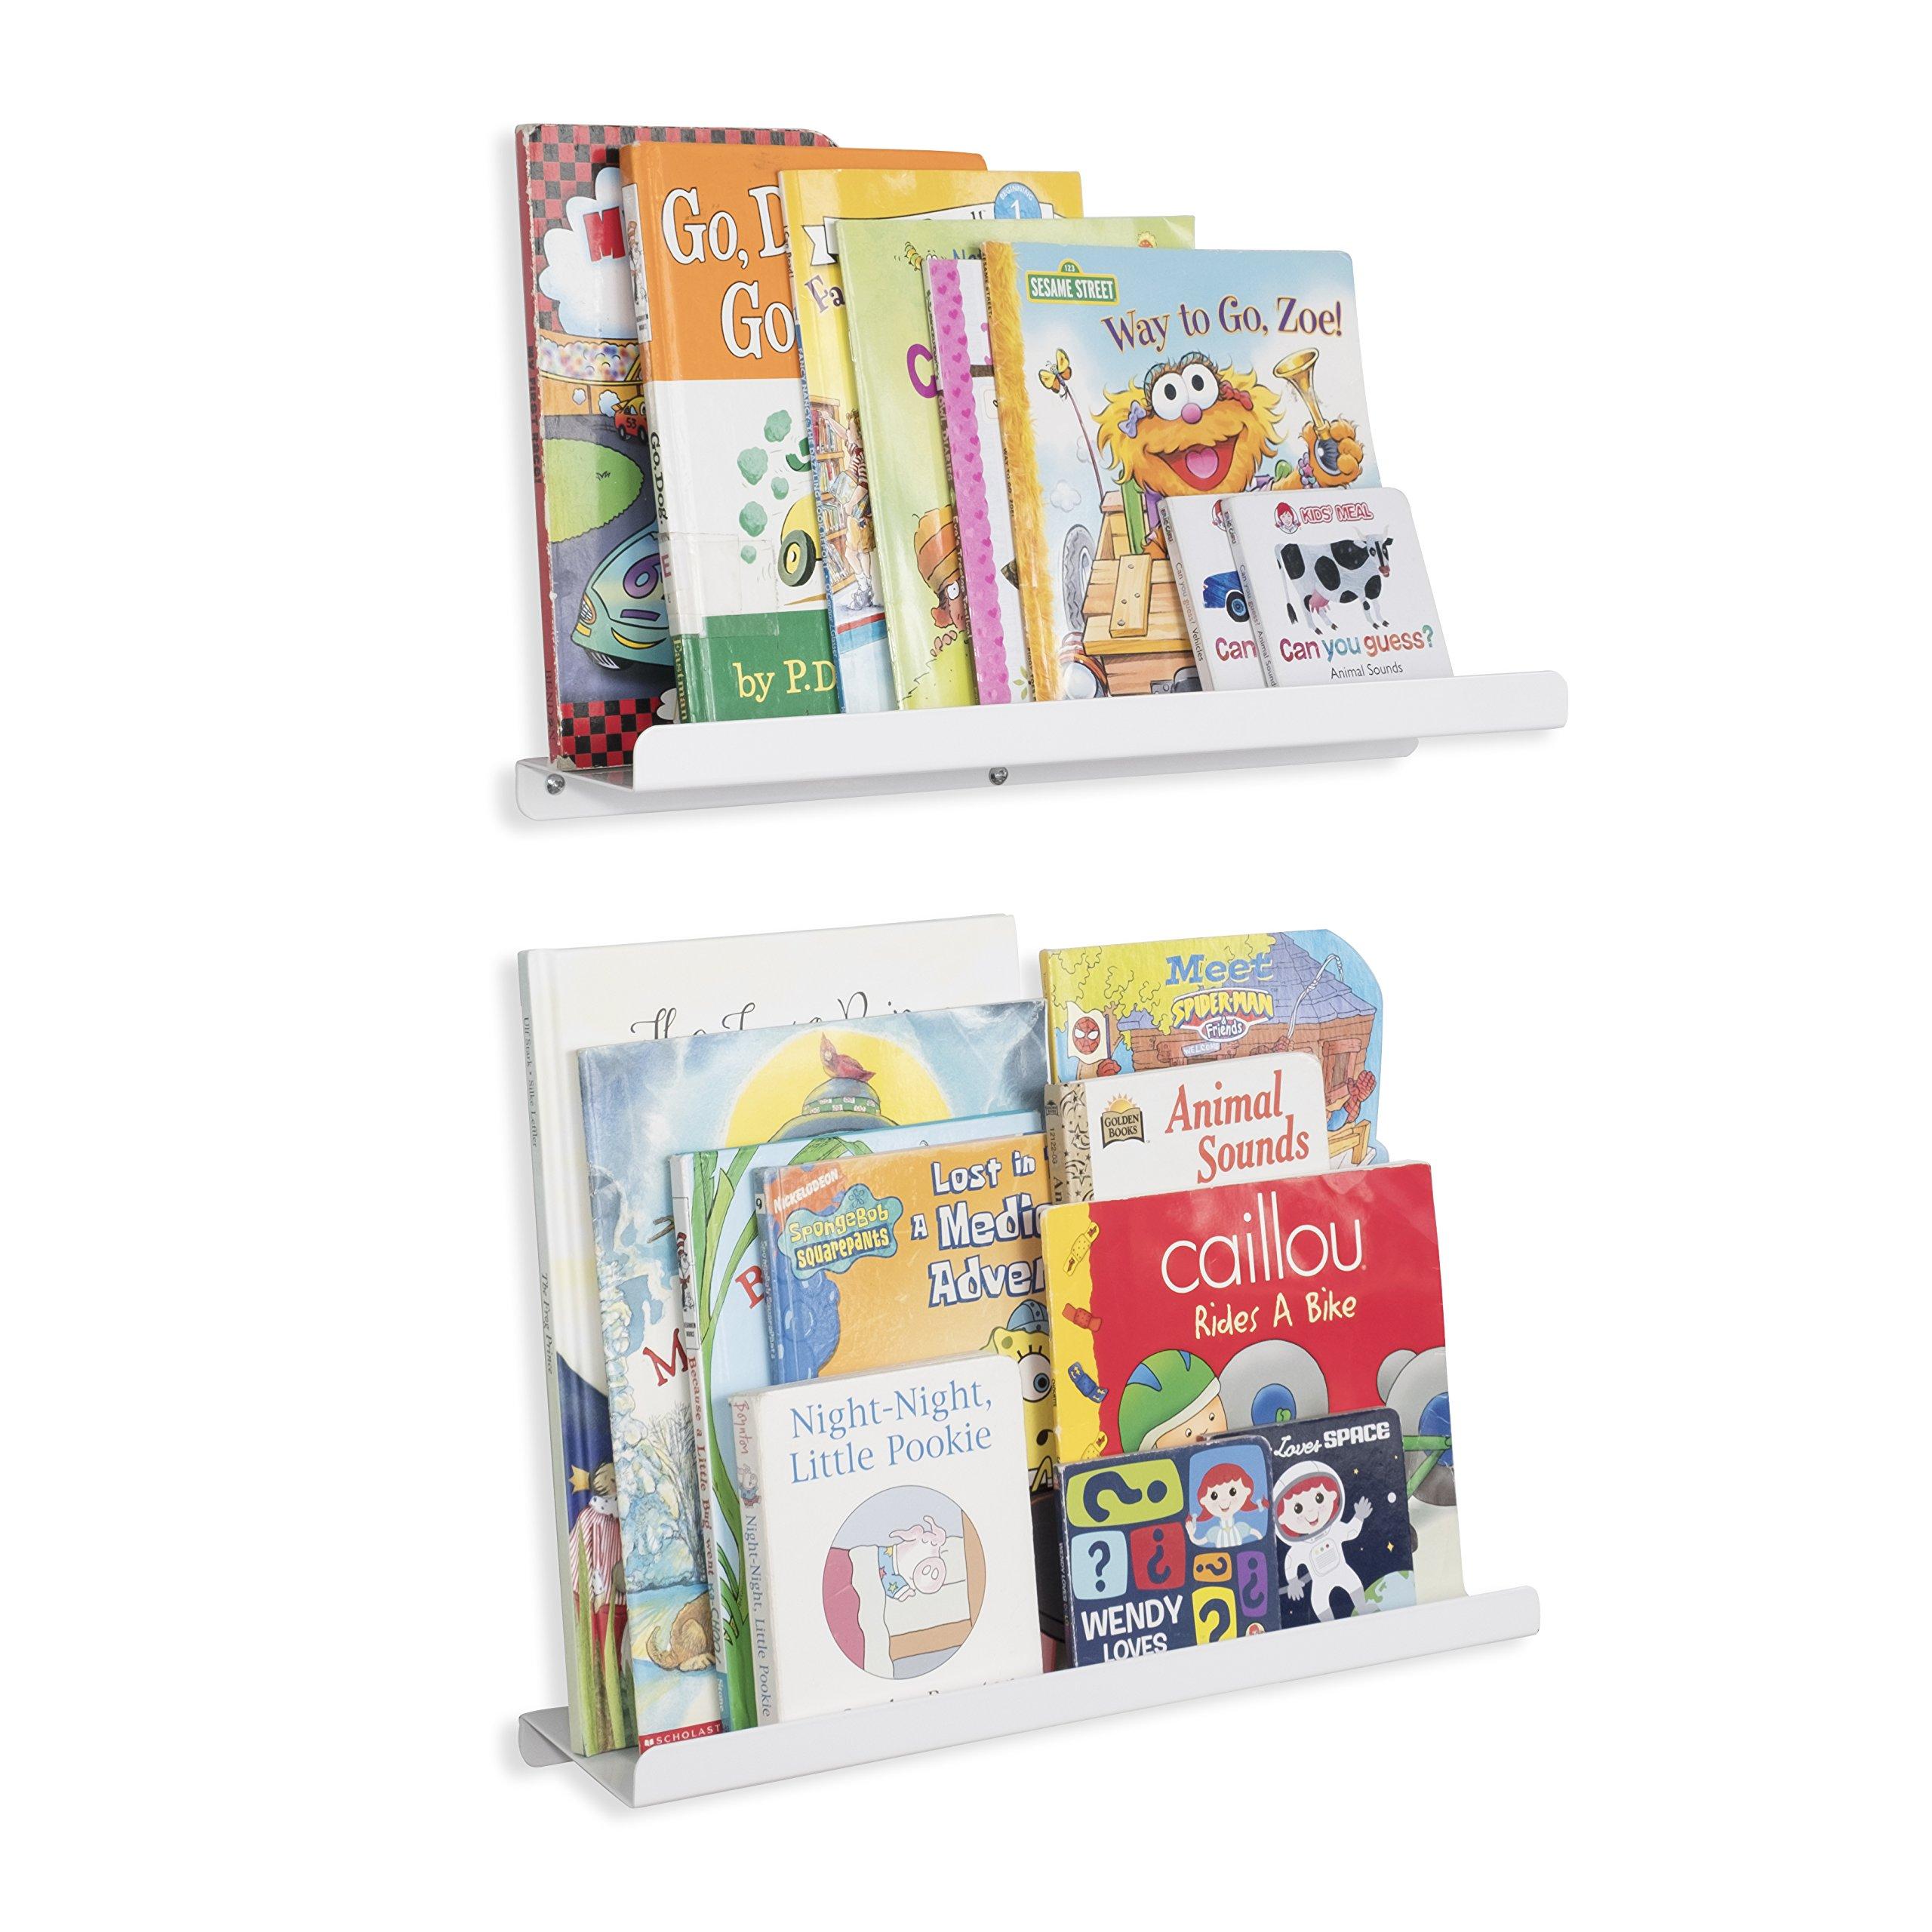 Wallniture Kids Floating Bookshelves - Nursery Room Decor Bookcase Display Metal Ledges White 17 Inch Set of 2